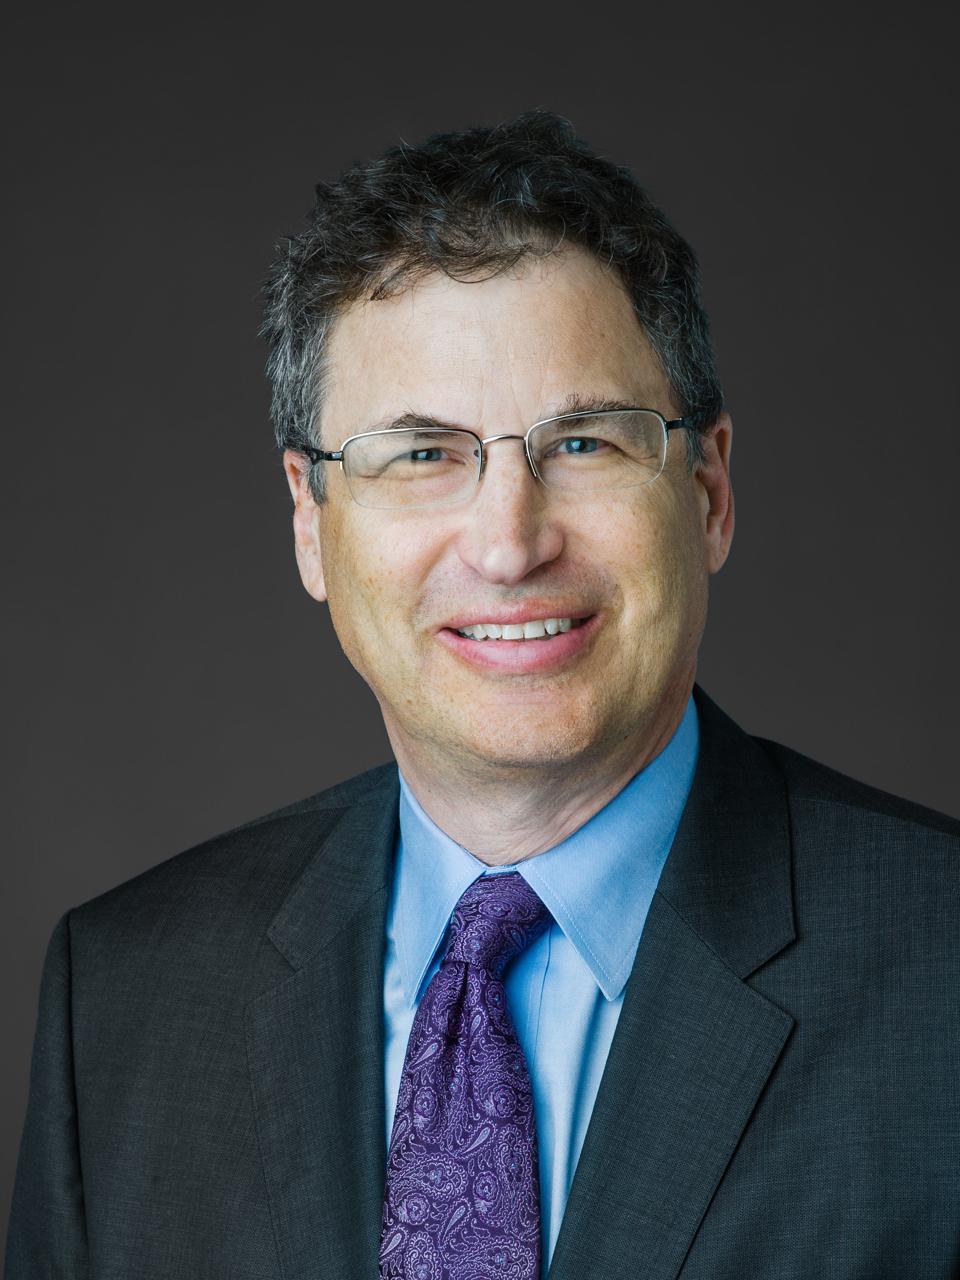 Gregg F. Witt CBRE Nonprofit Practice Group